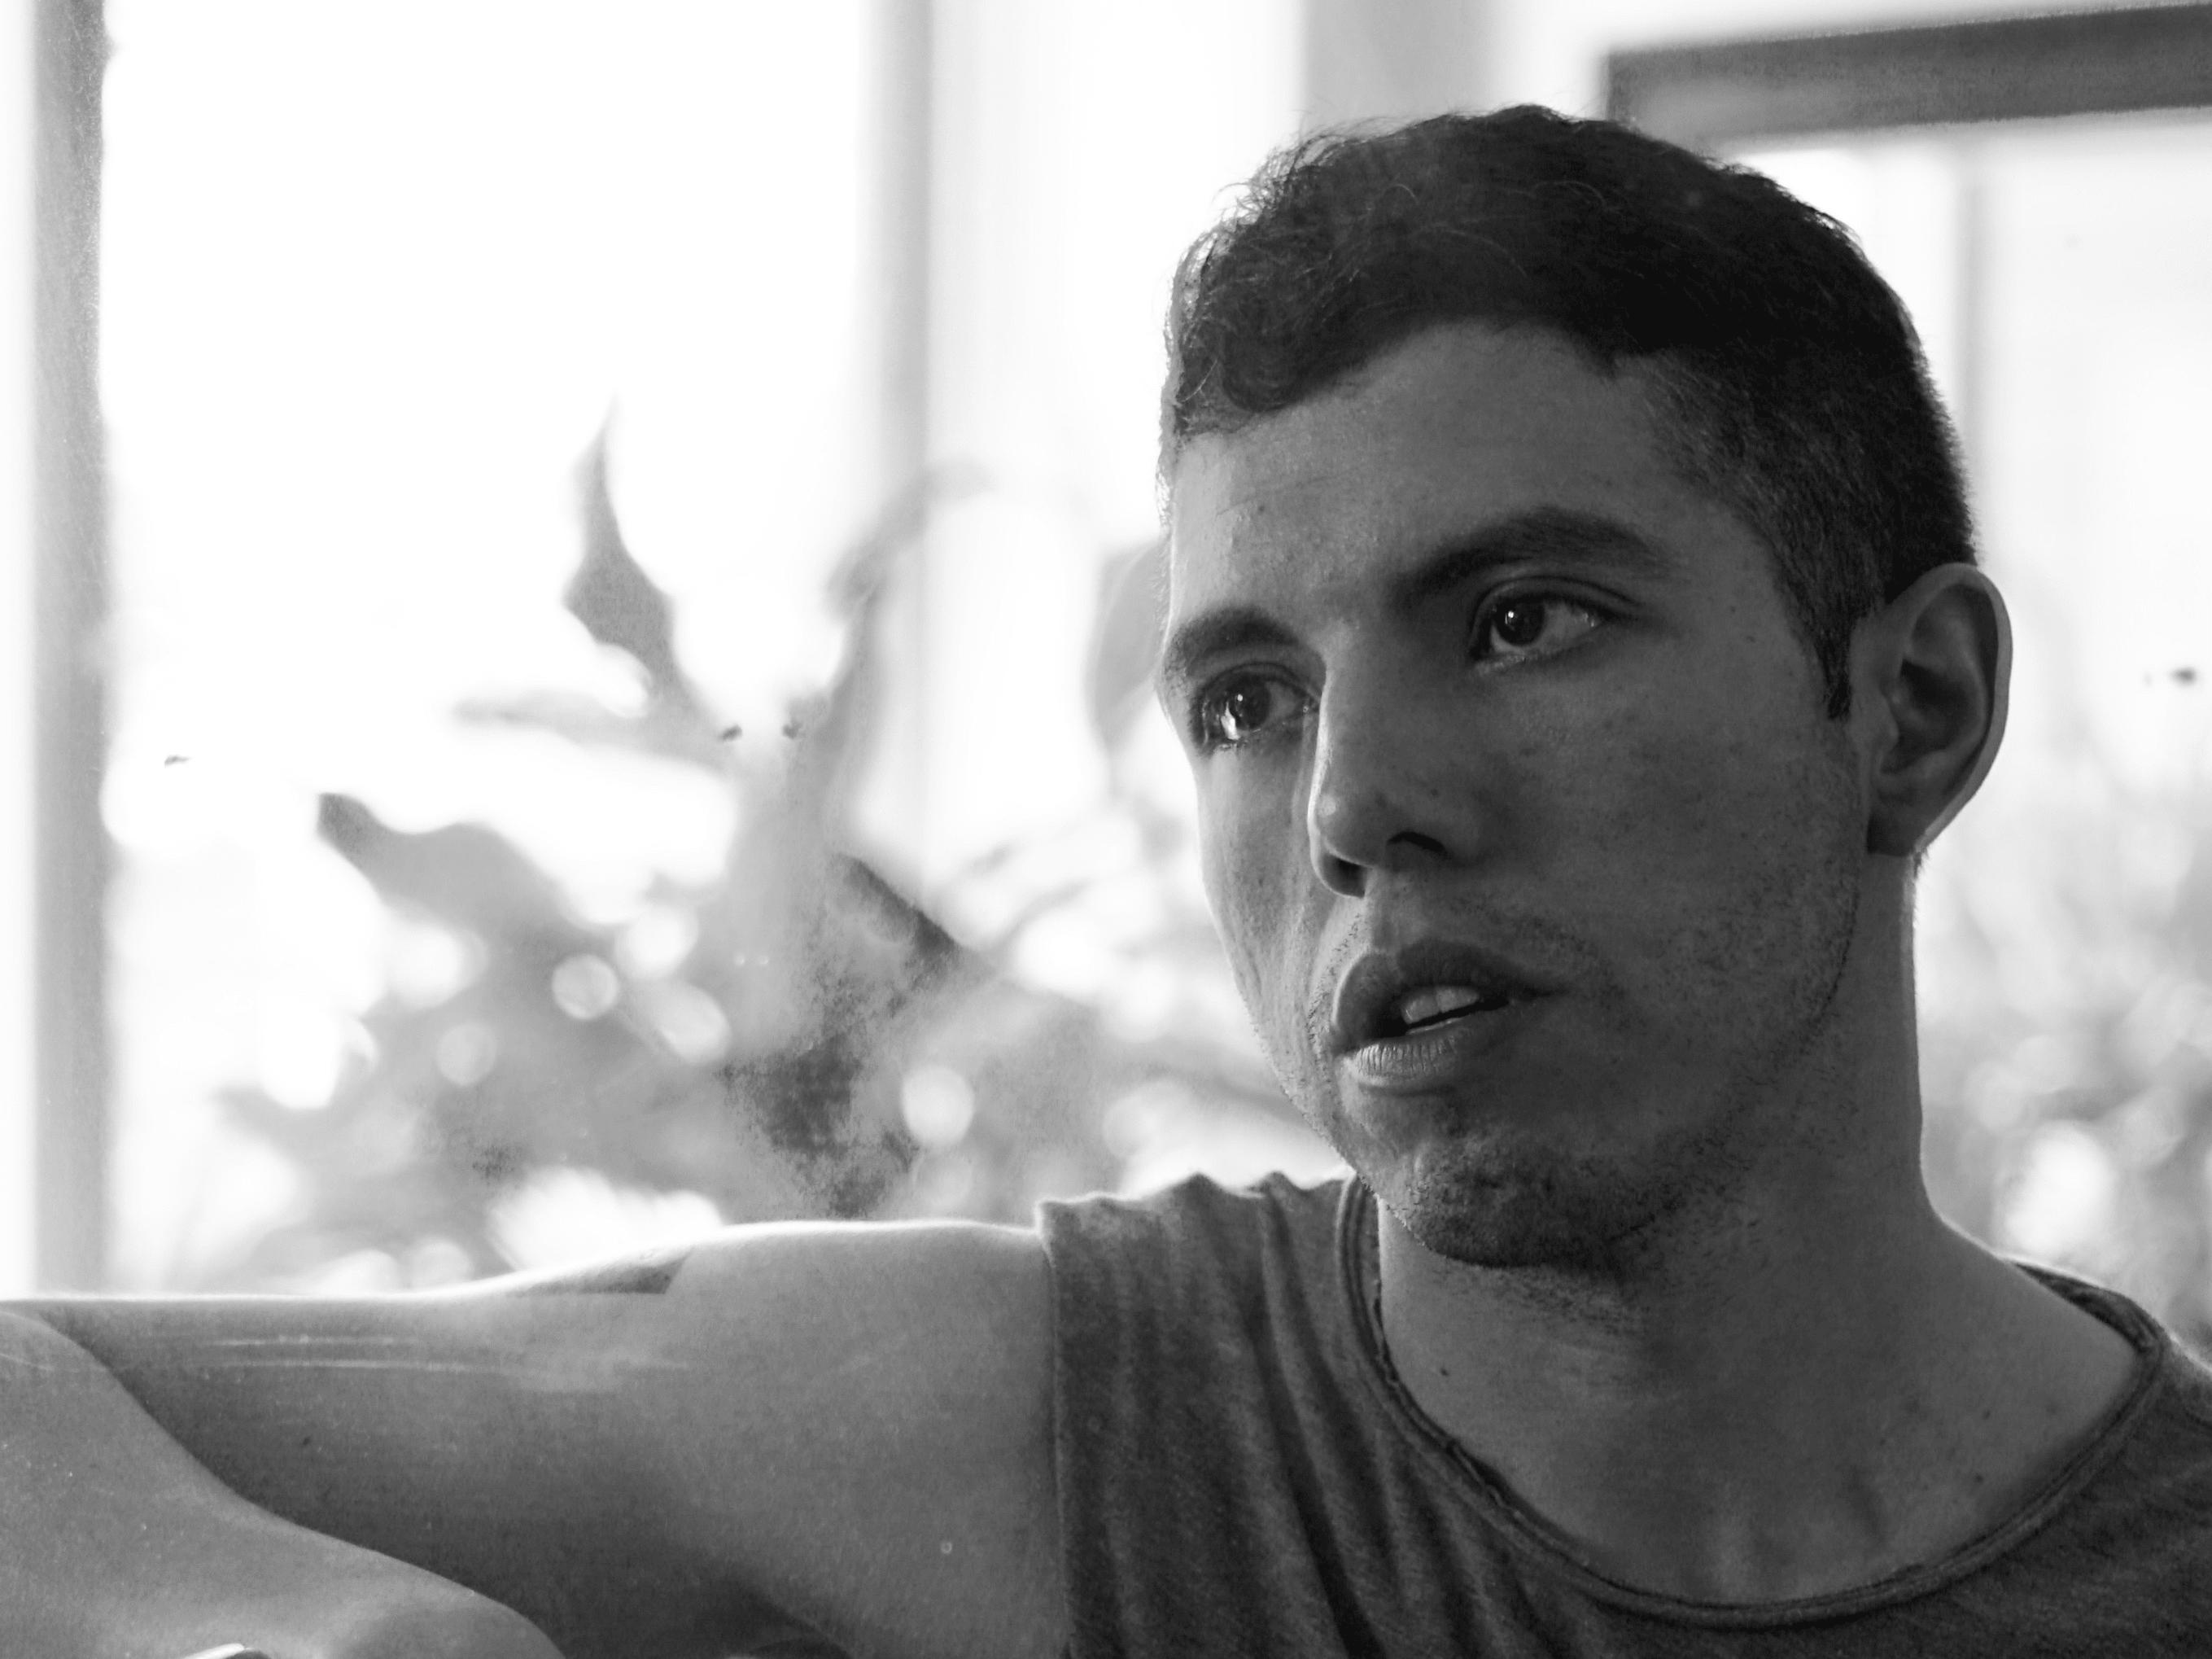 Francisco Gonzalez-Rosas